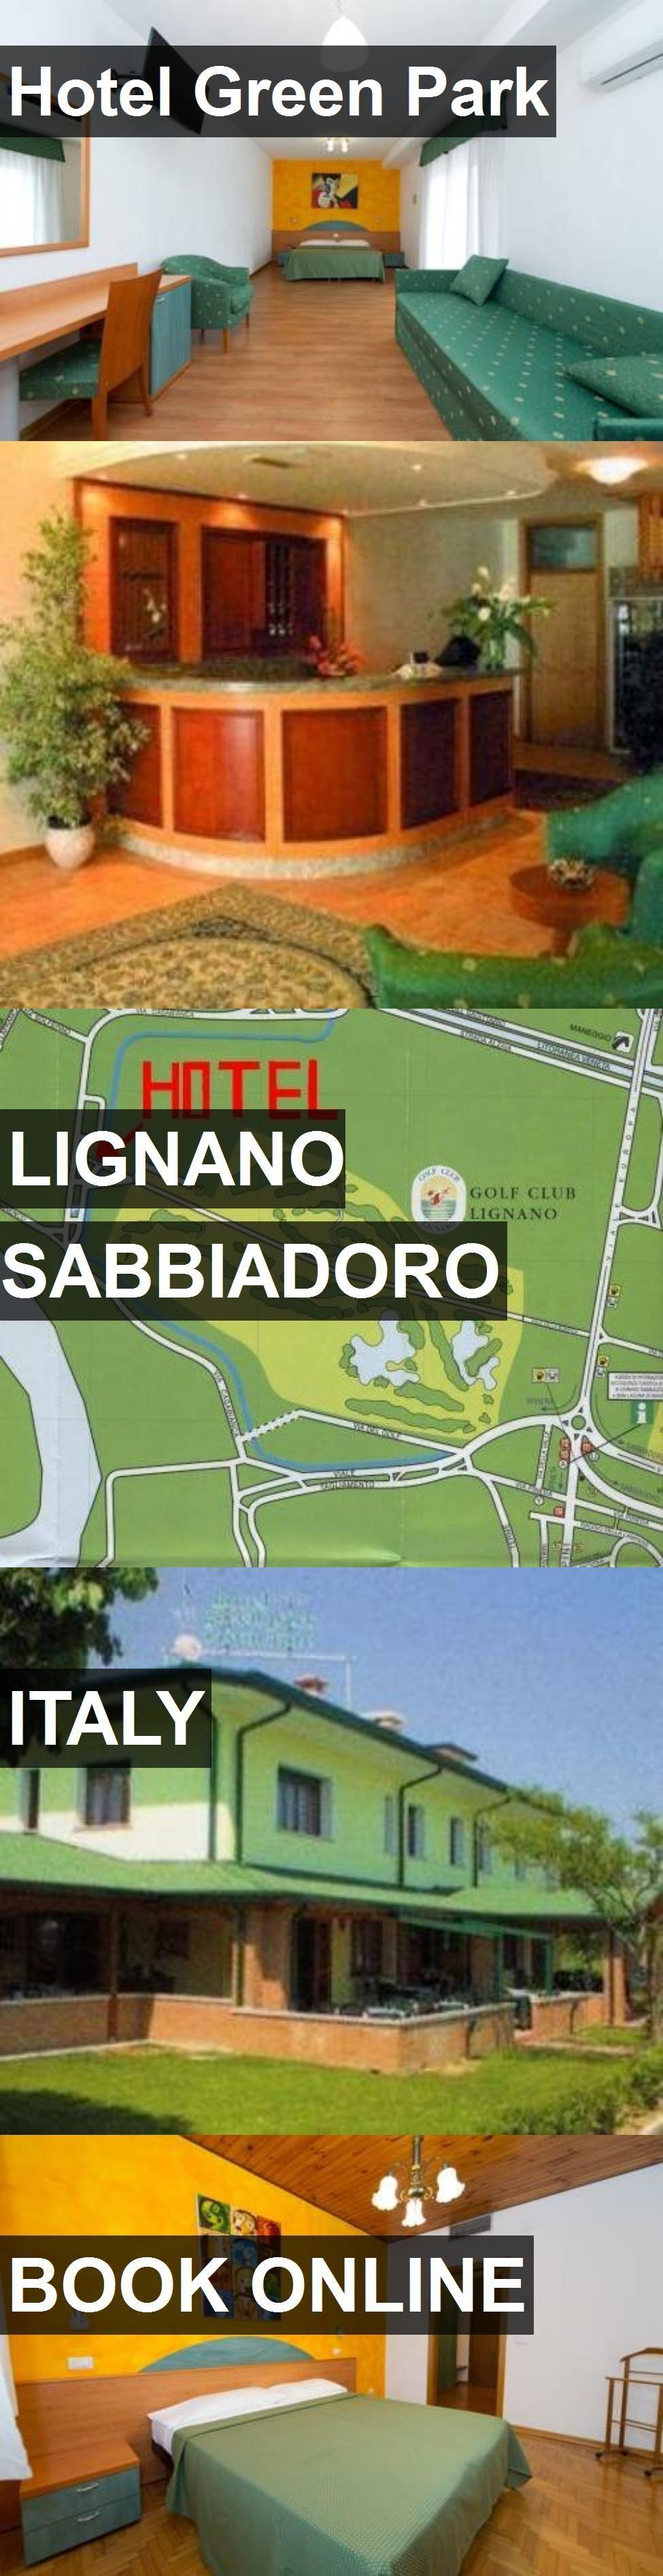 Hotel Hotel Green Park in Lignano Sabbiadoro, Italy. For